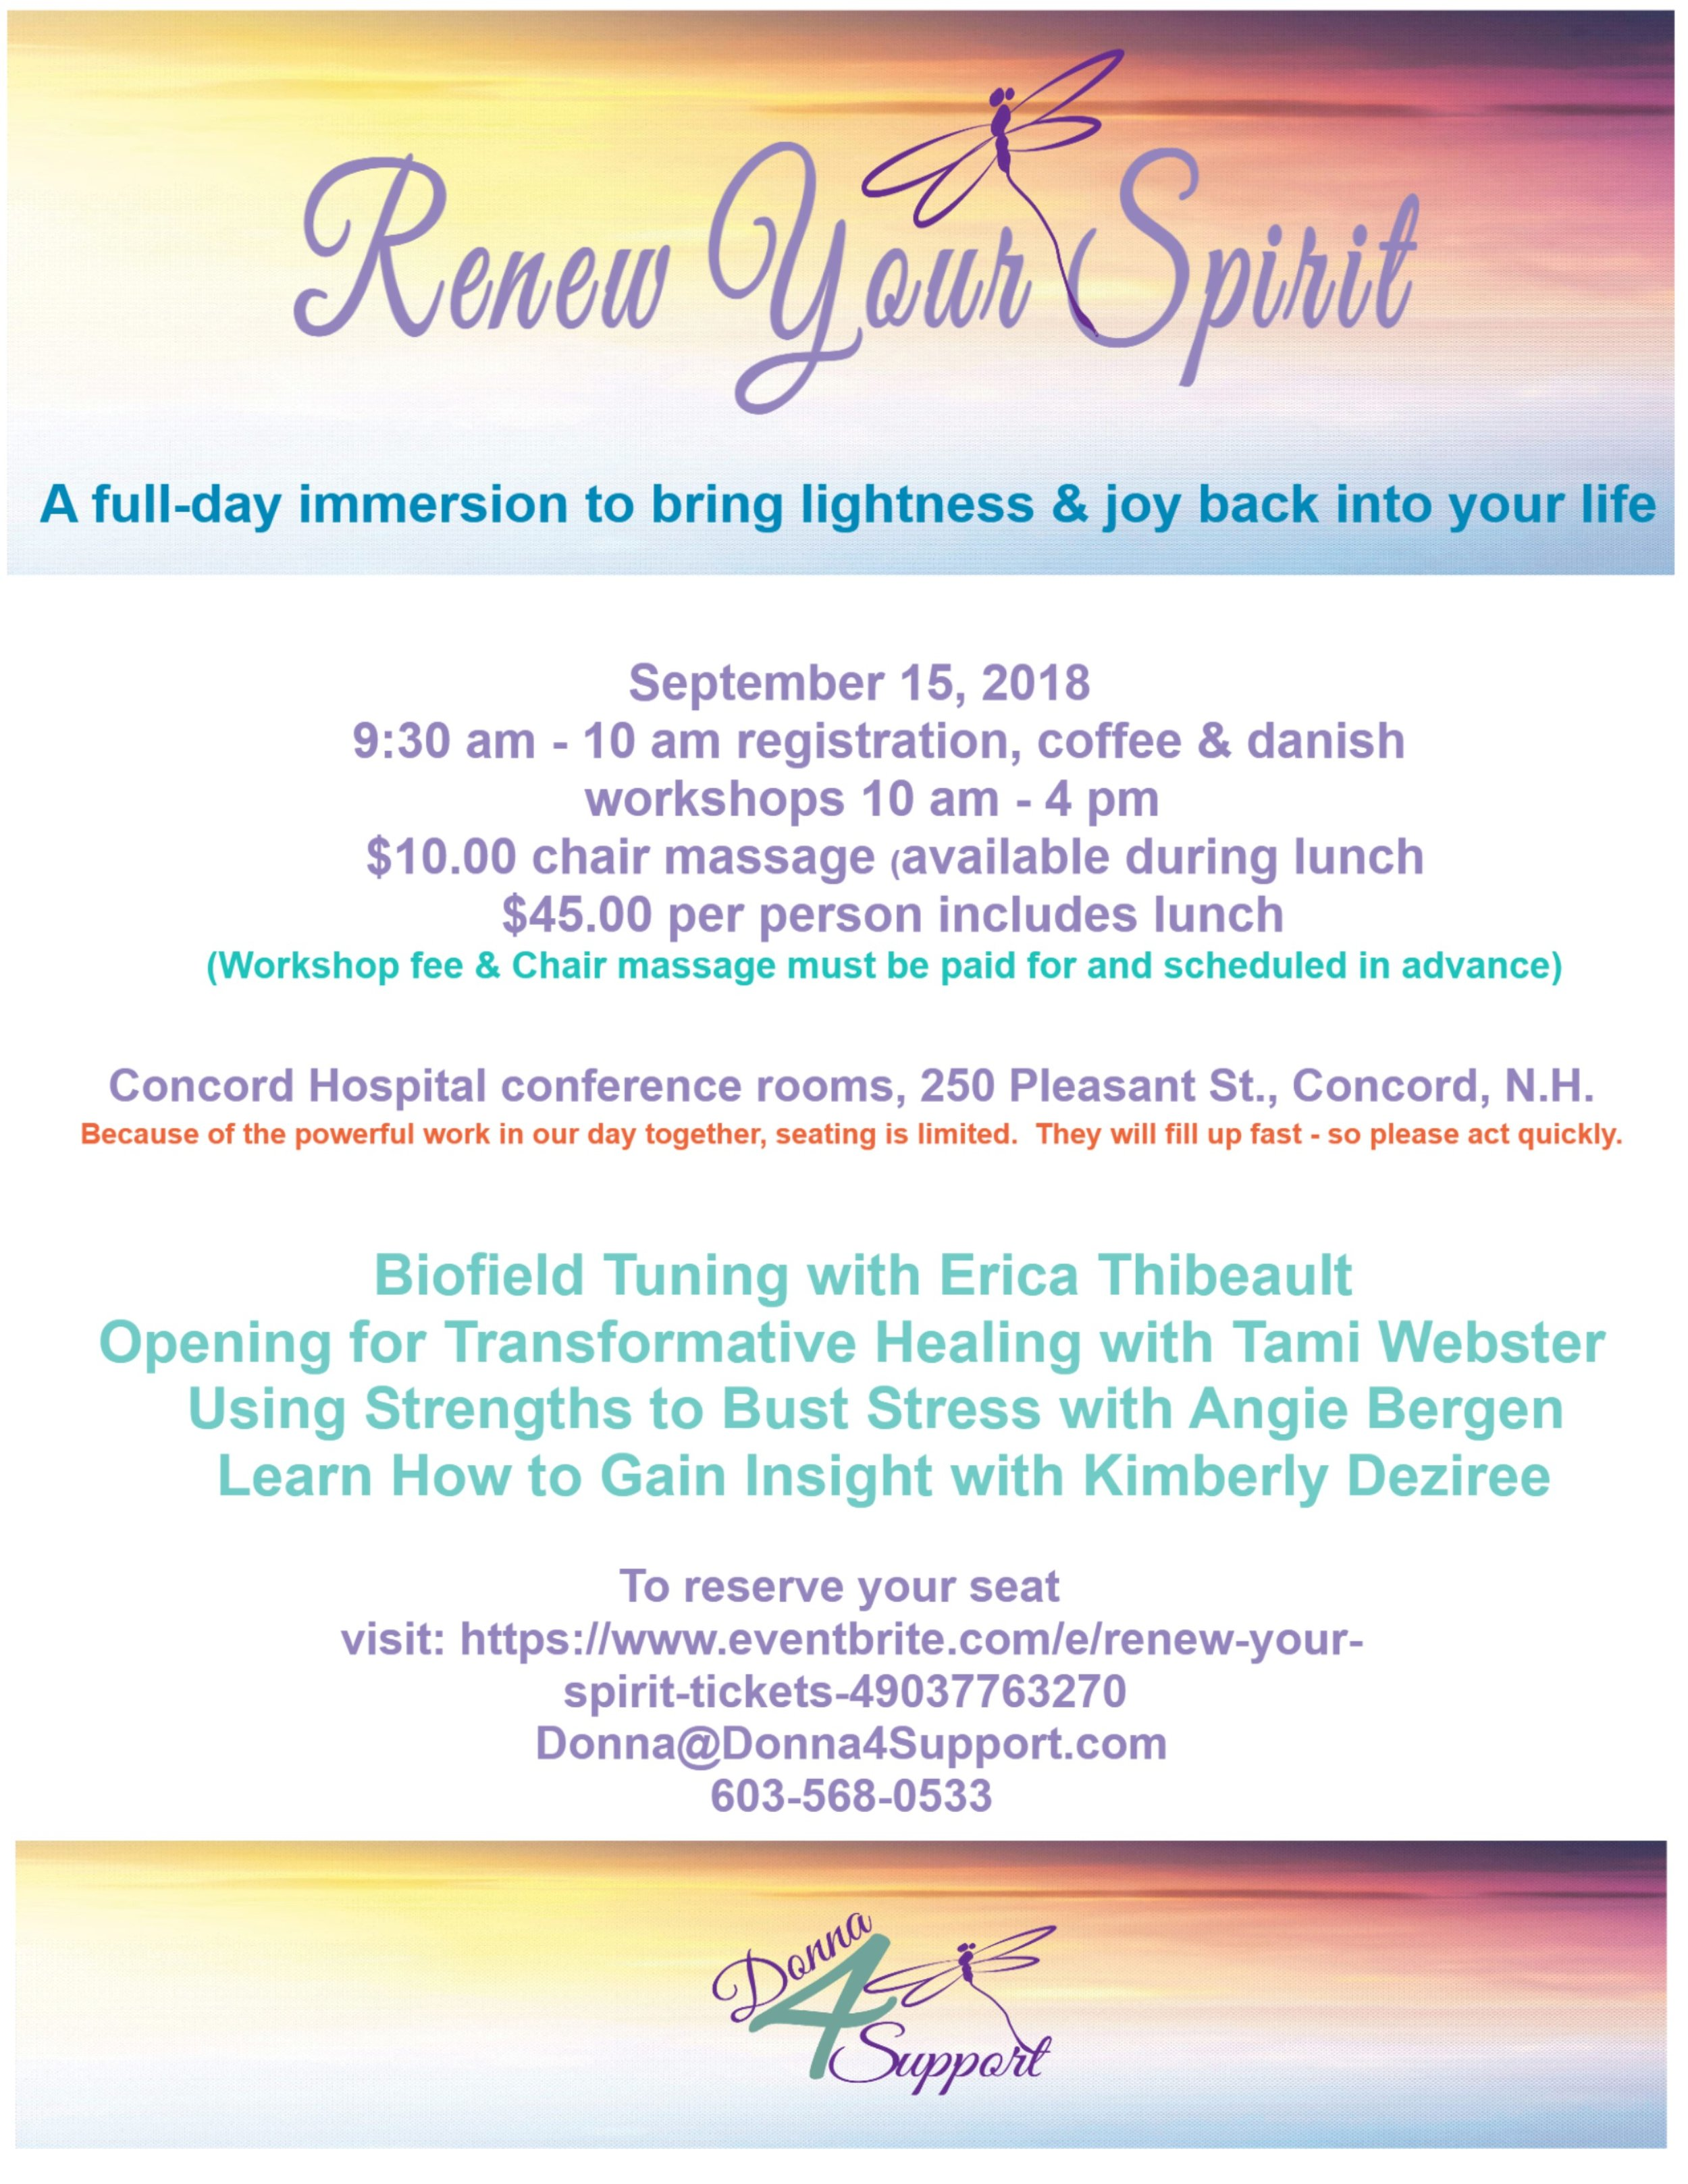 Renew your spirit flyer.jpg